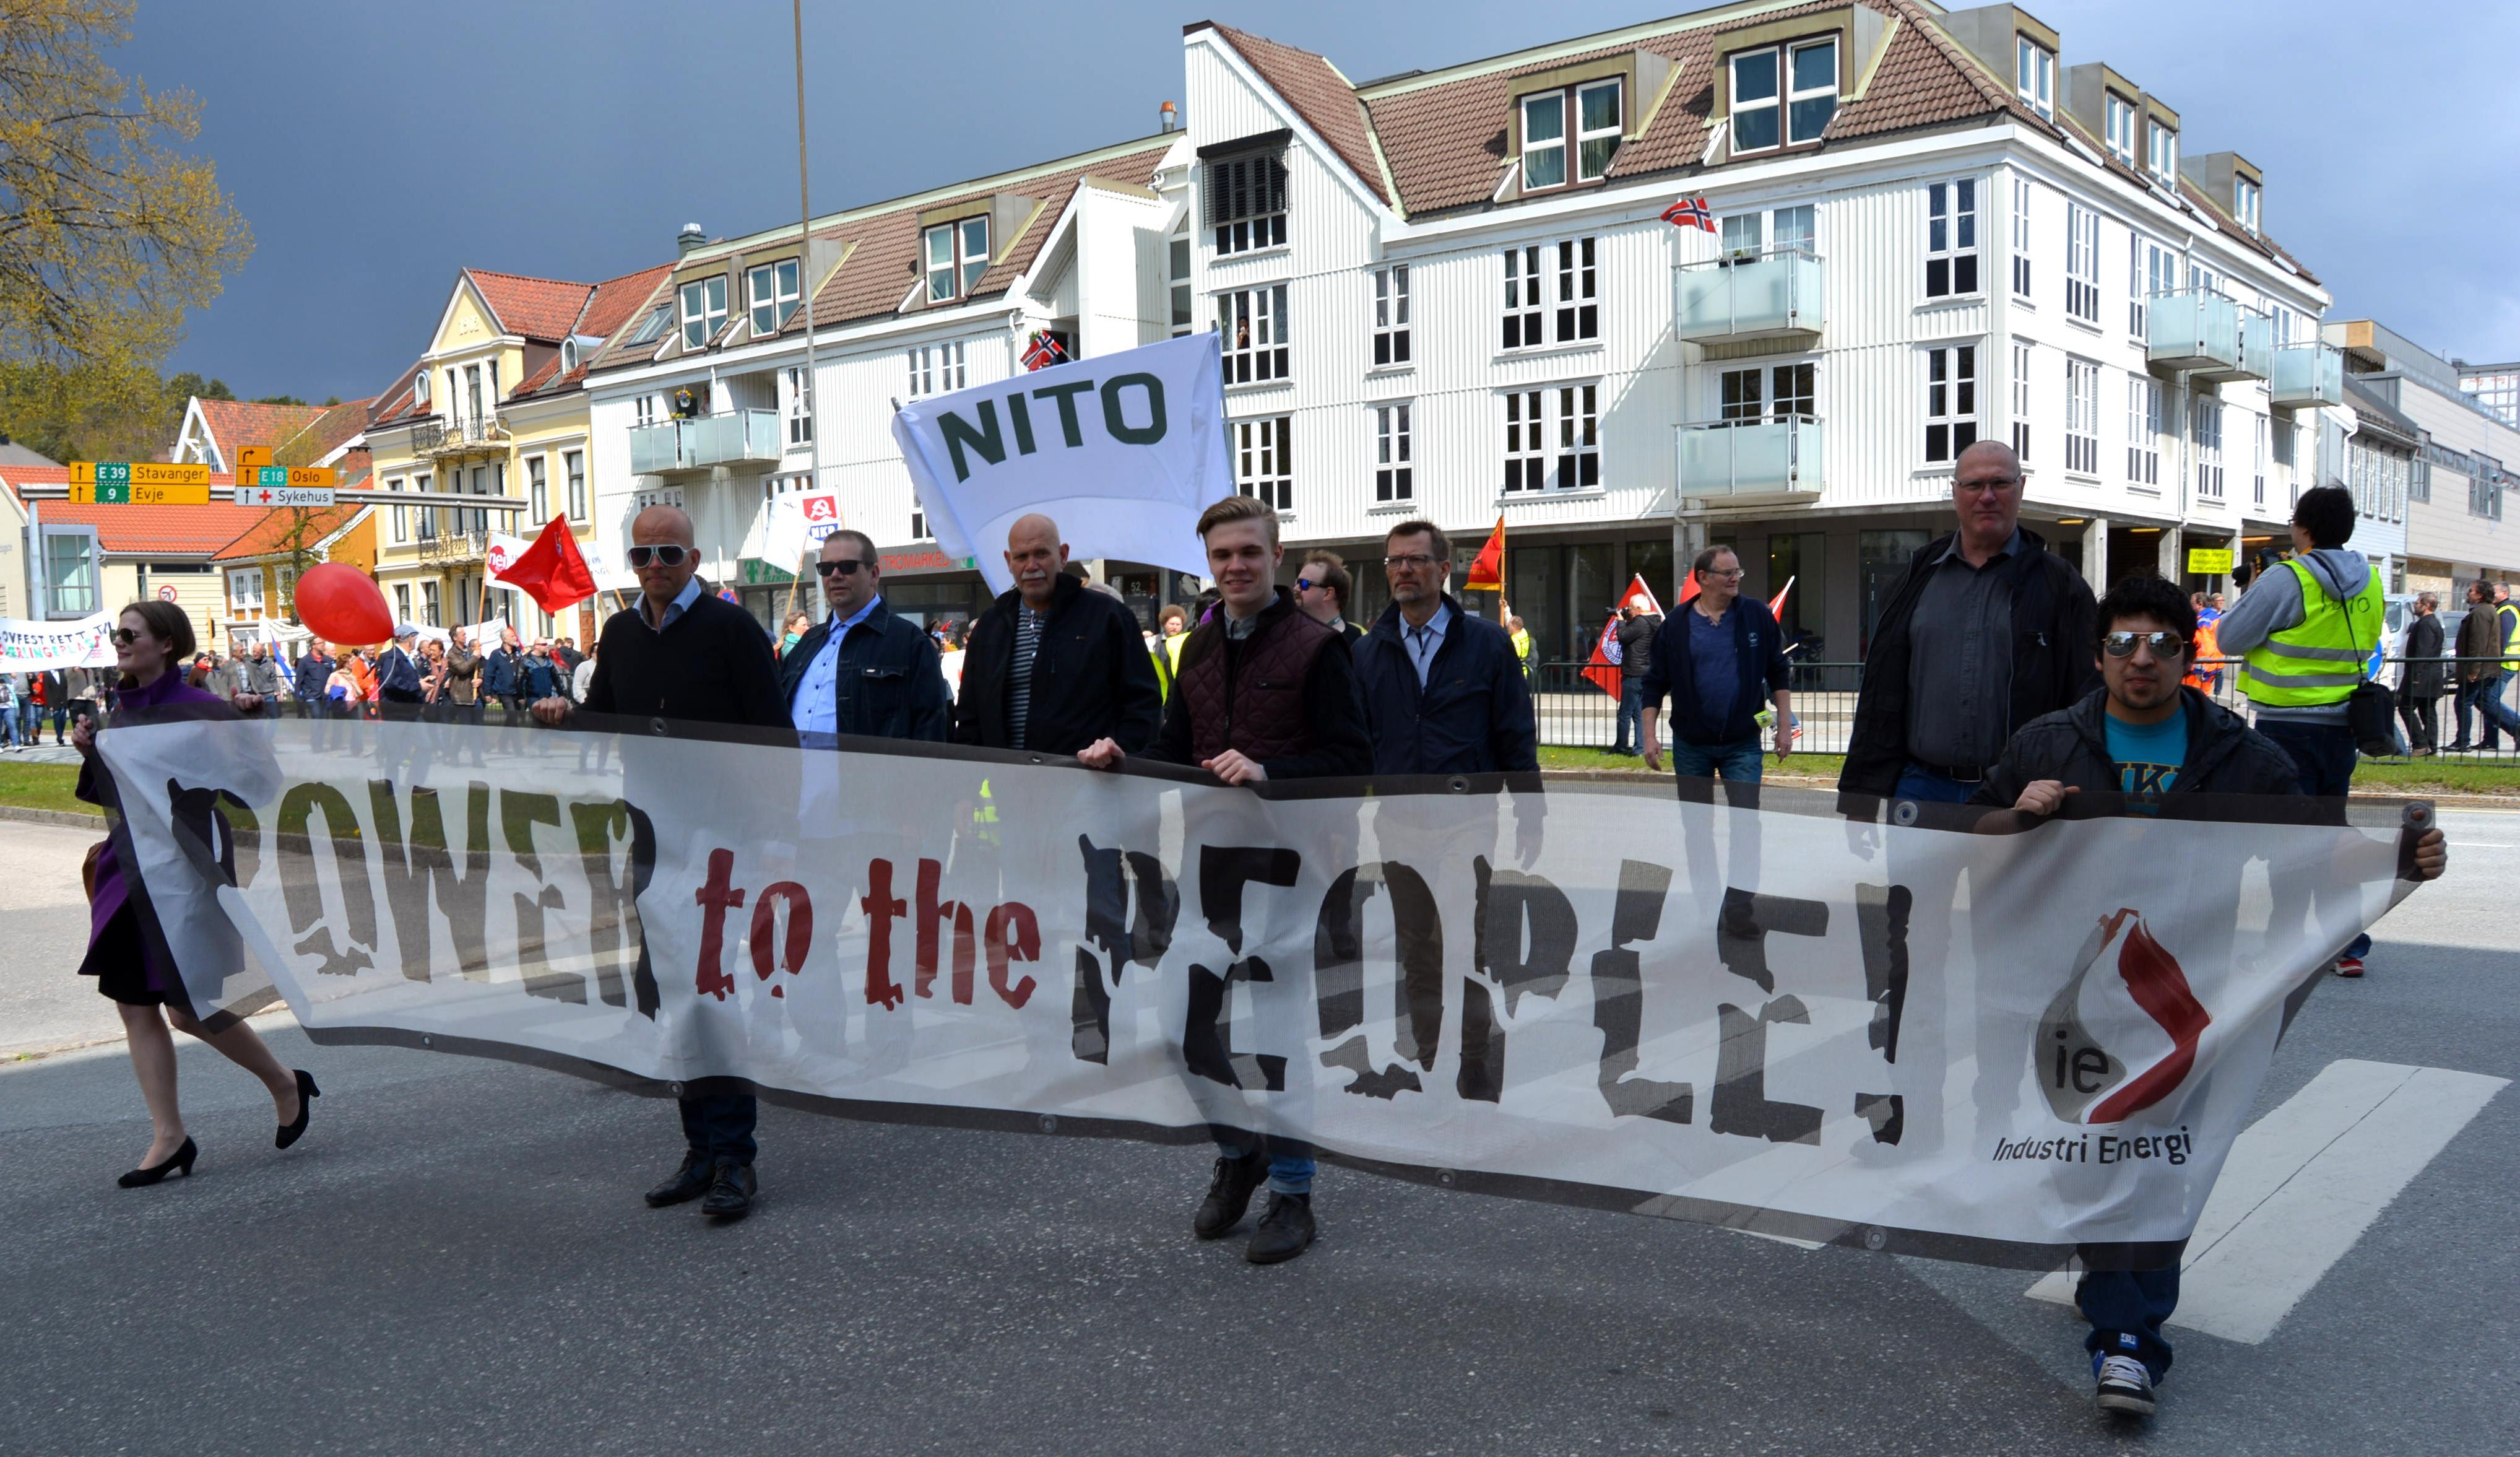 1. mai-demo i Kristiansand